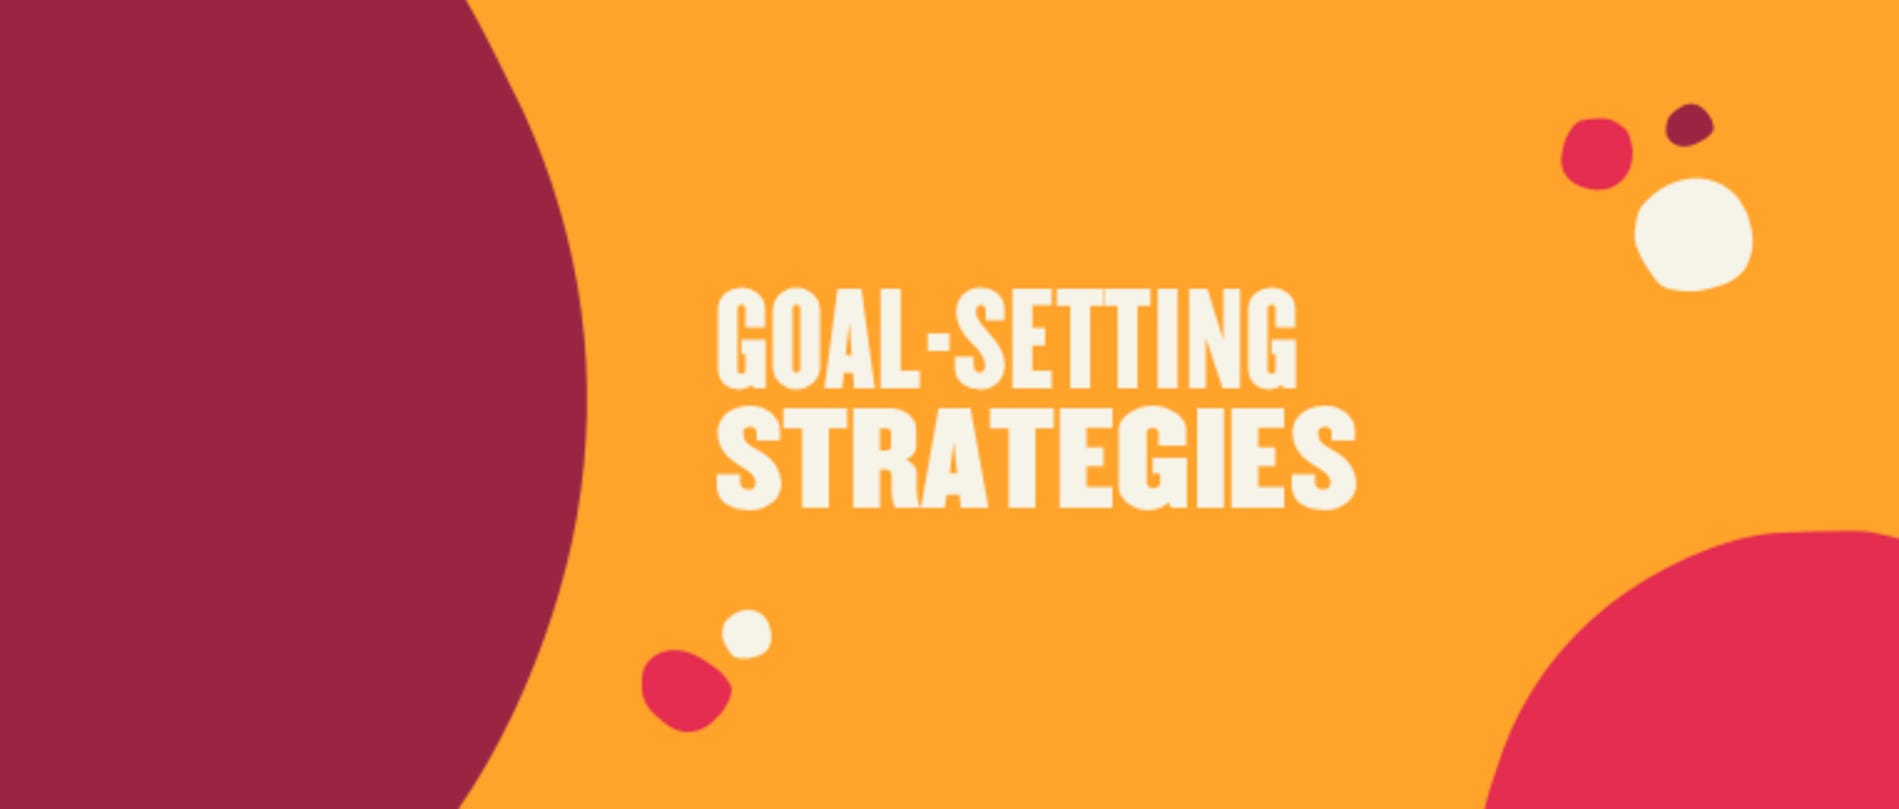 Top six strategies for organizational goal setting - Goal-setting-strategies-Blog-post.png